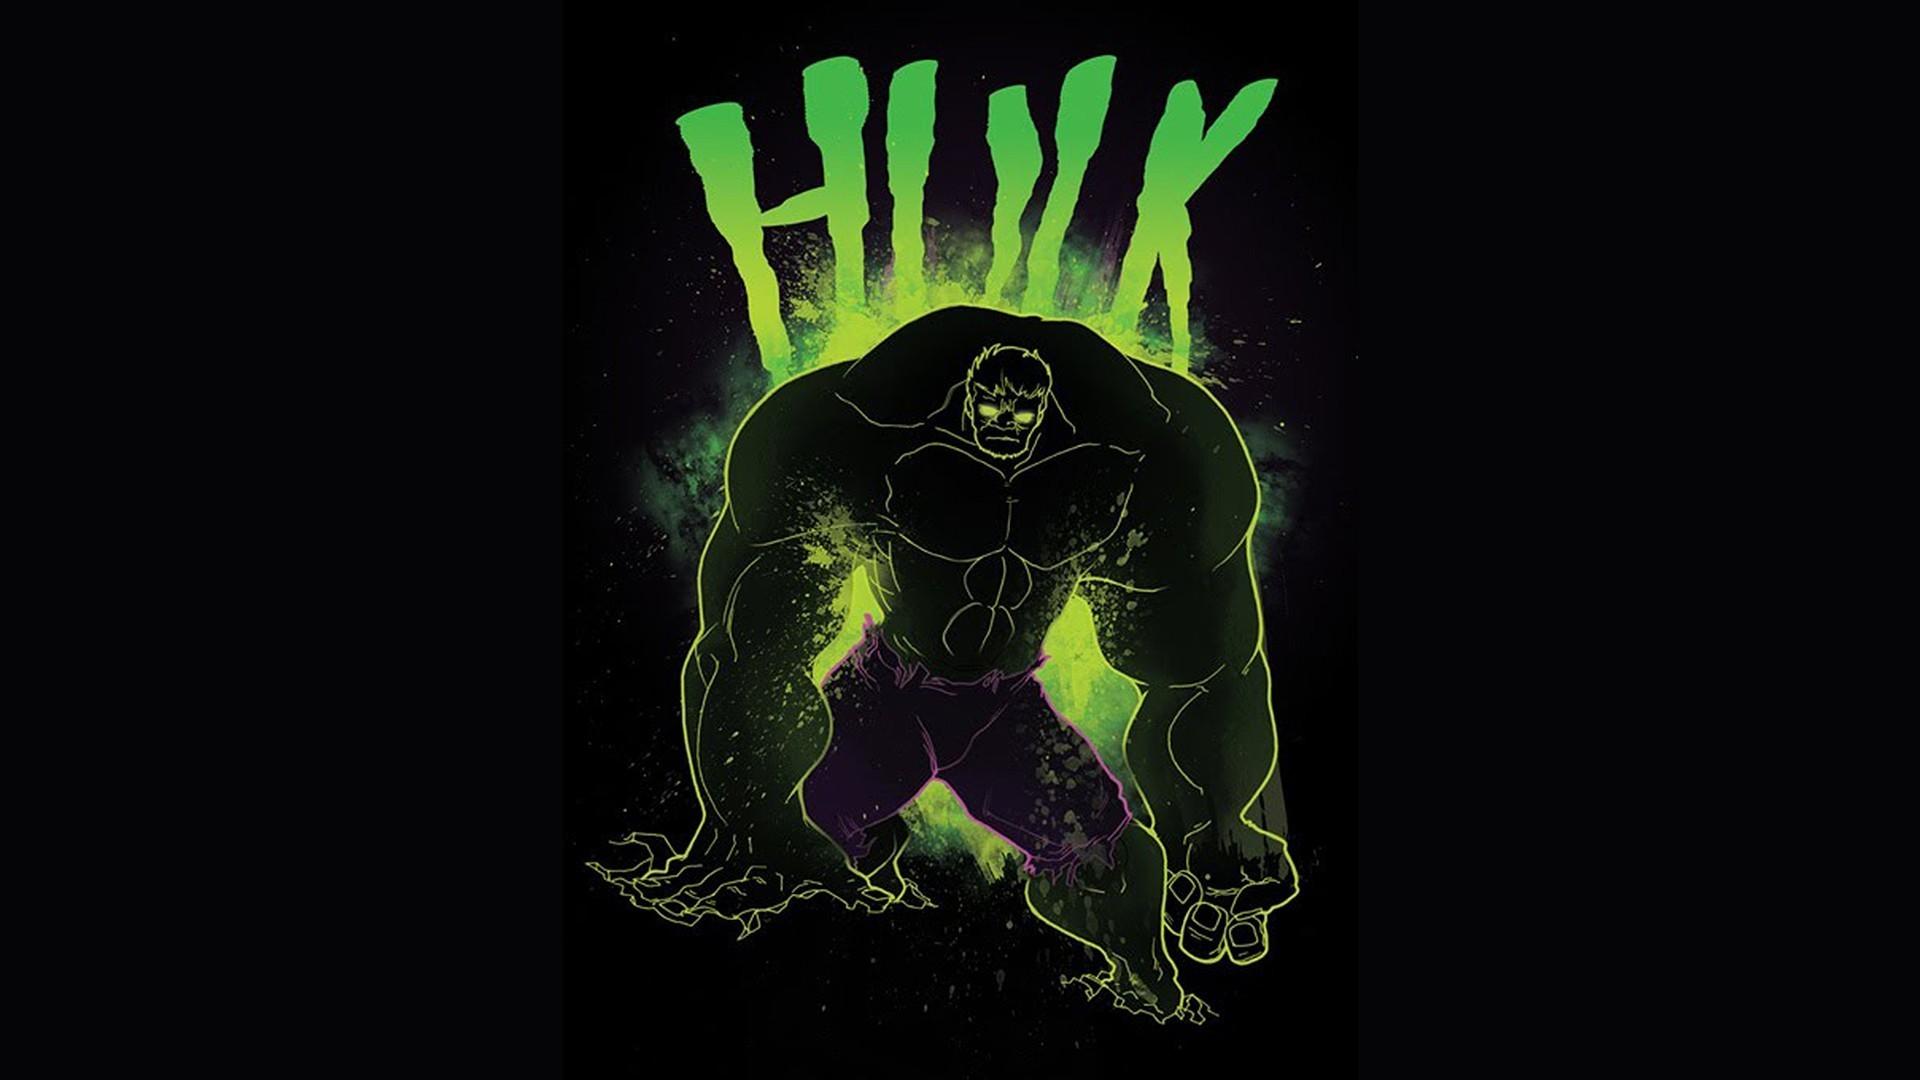 Hulk marvel comics black background fan art wallpaper 1920x1080